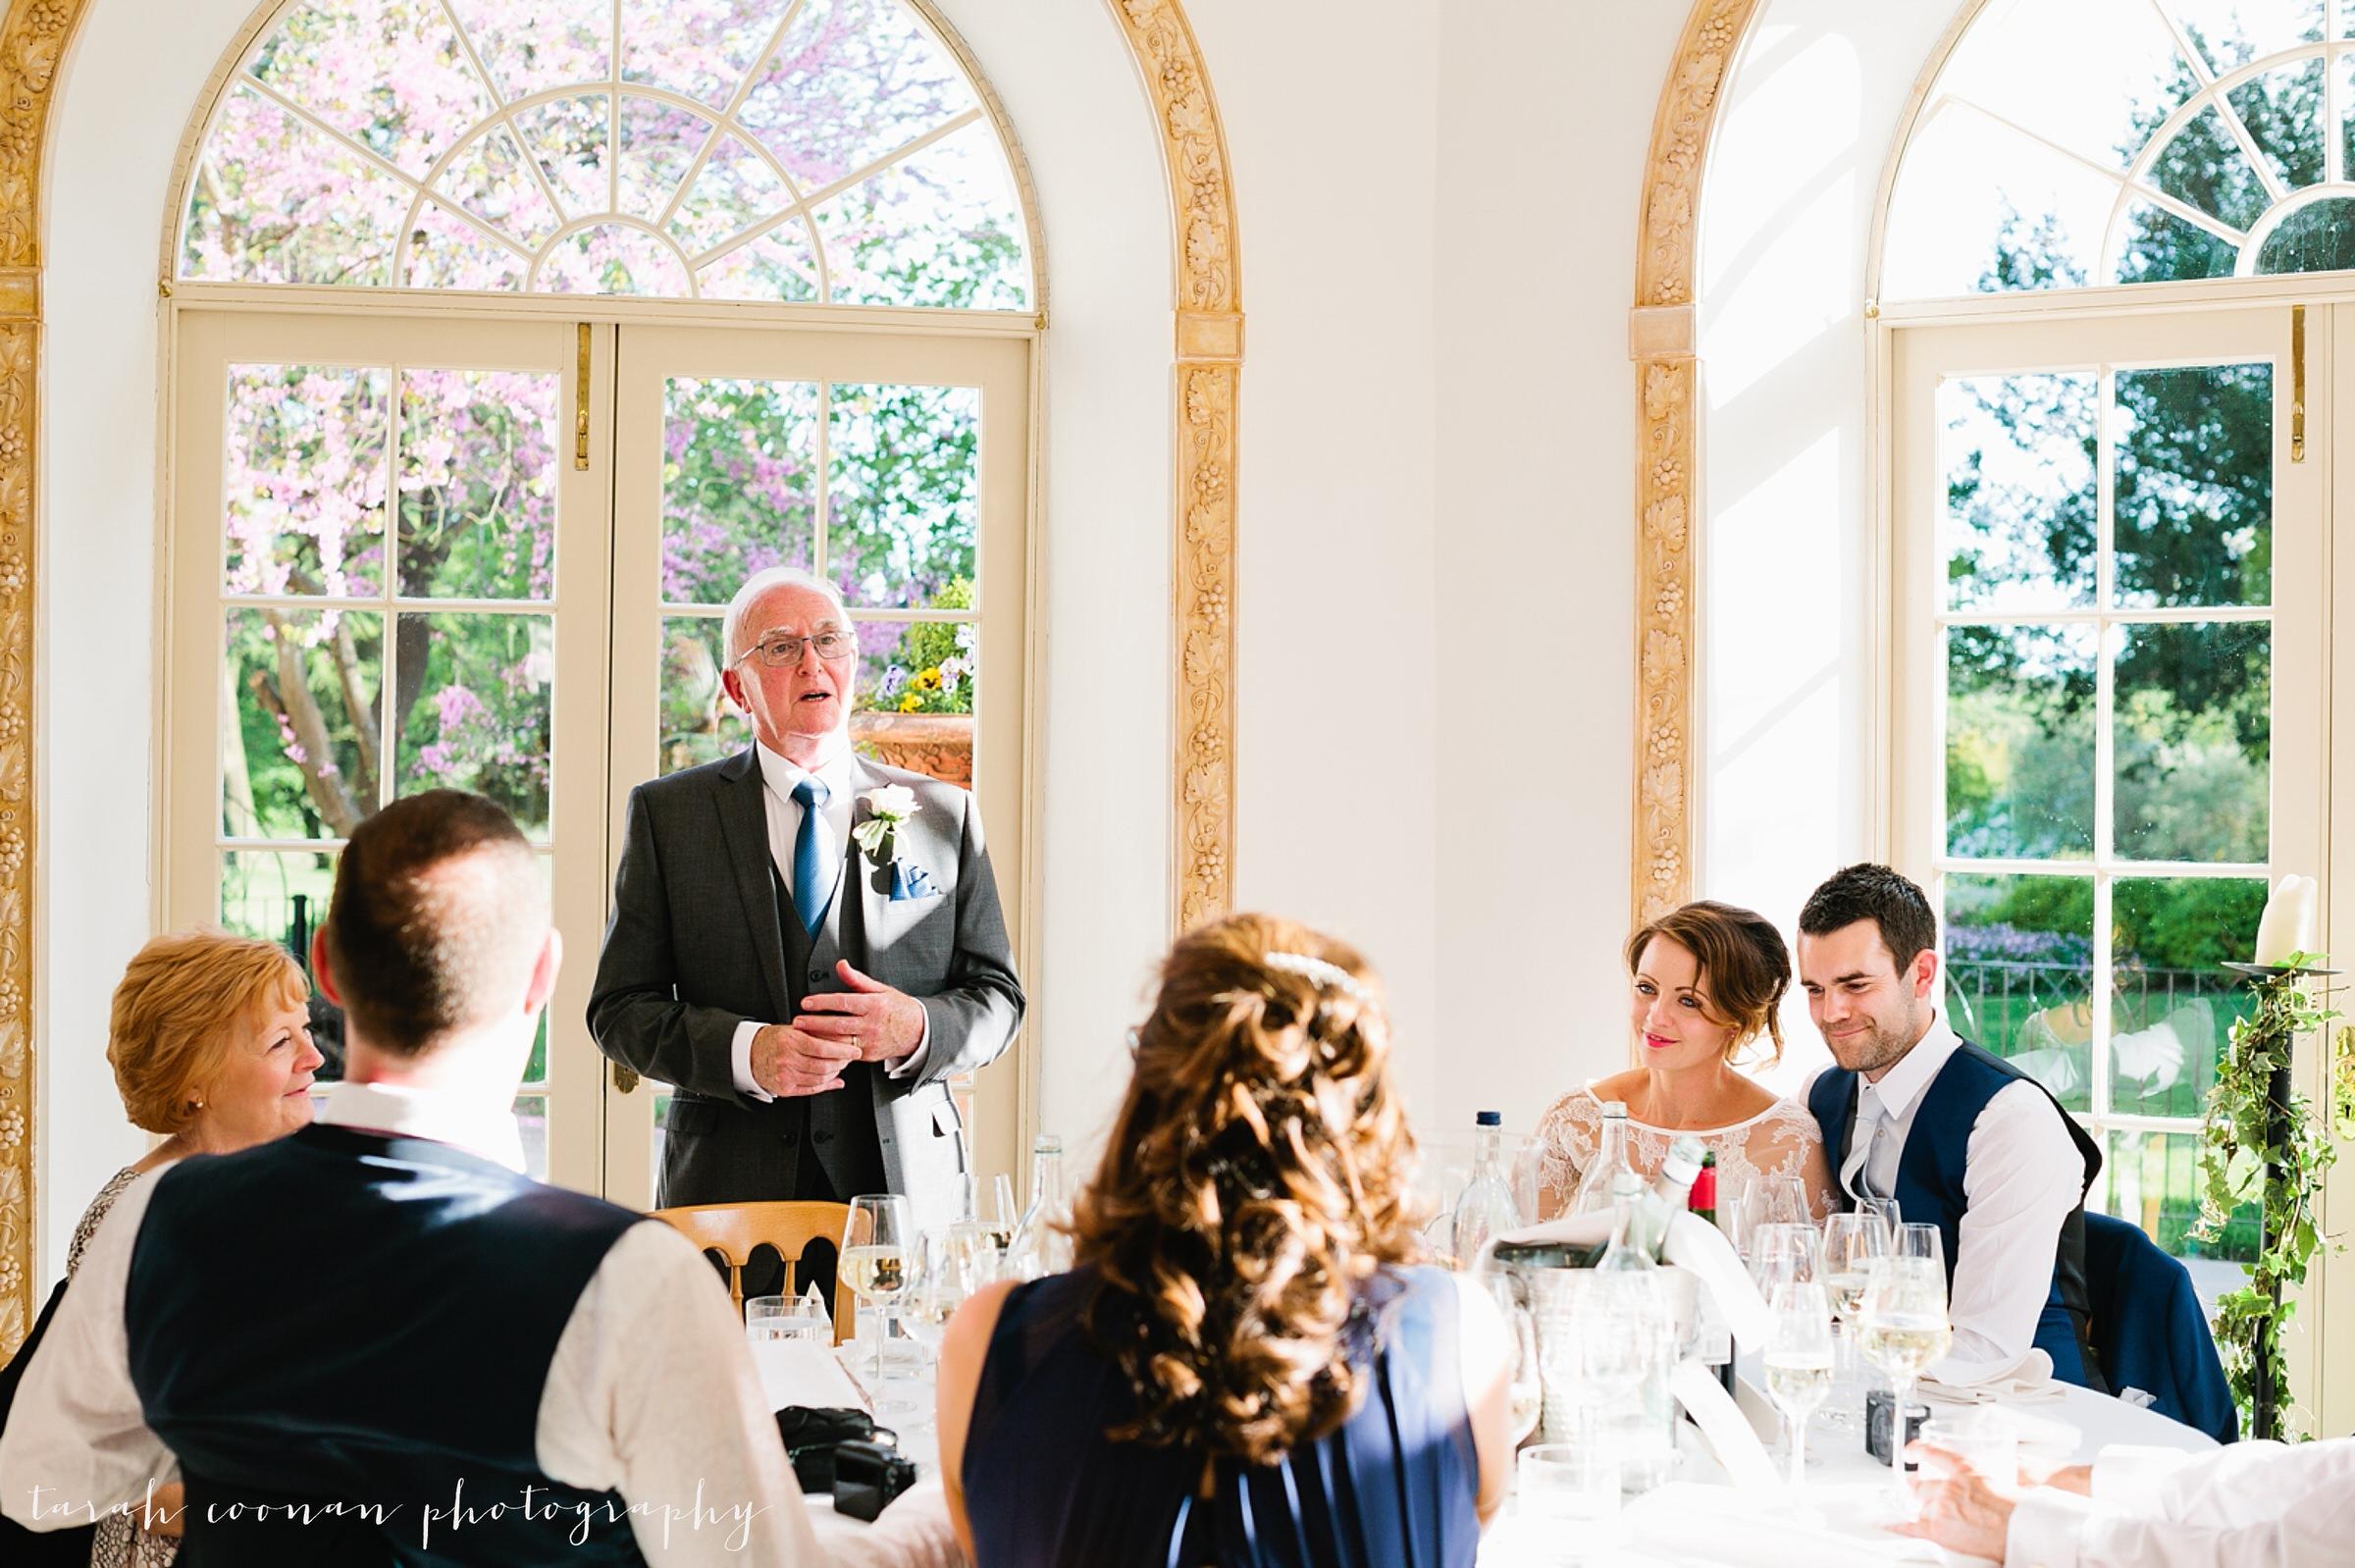 northbrook-park-wedding-photographer_071